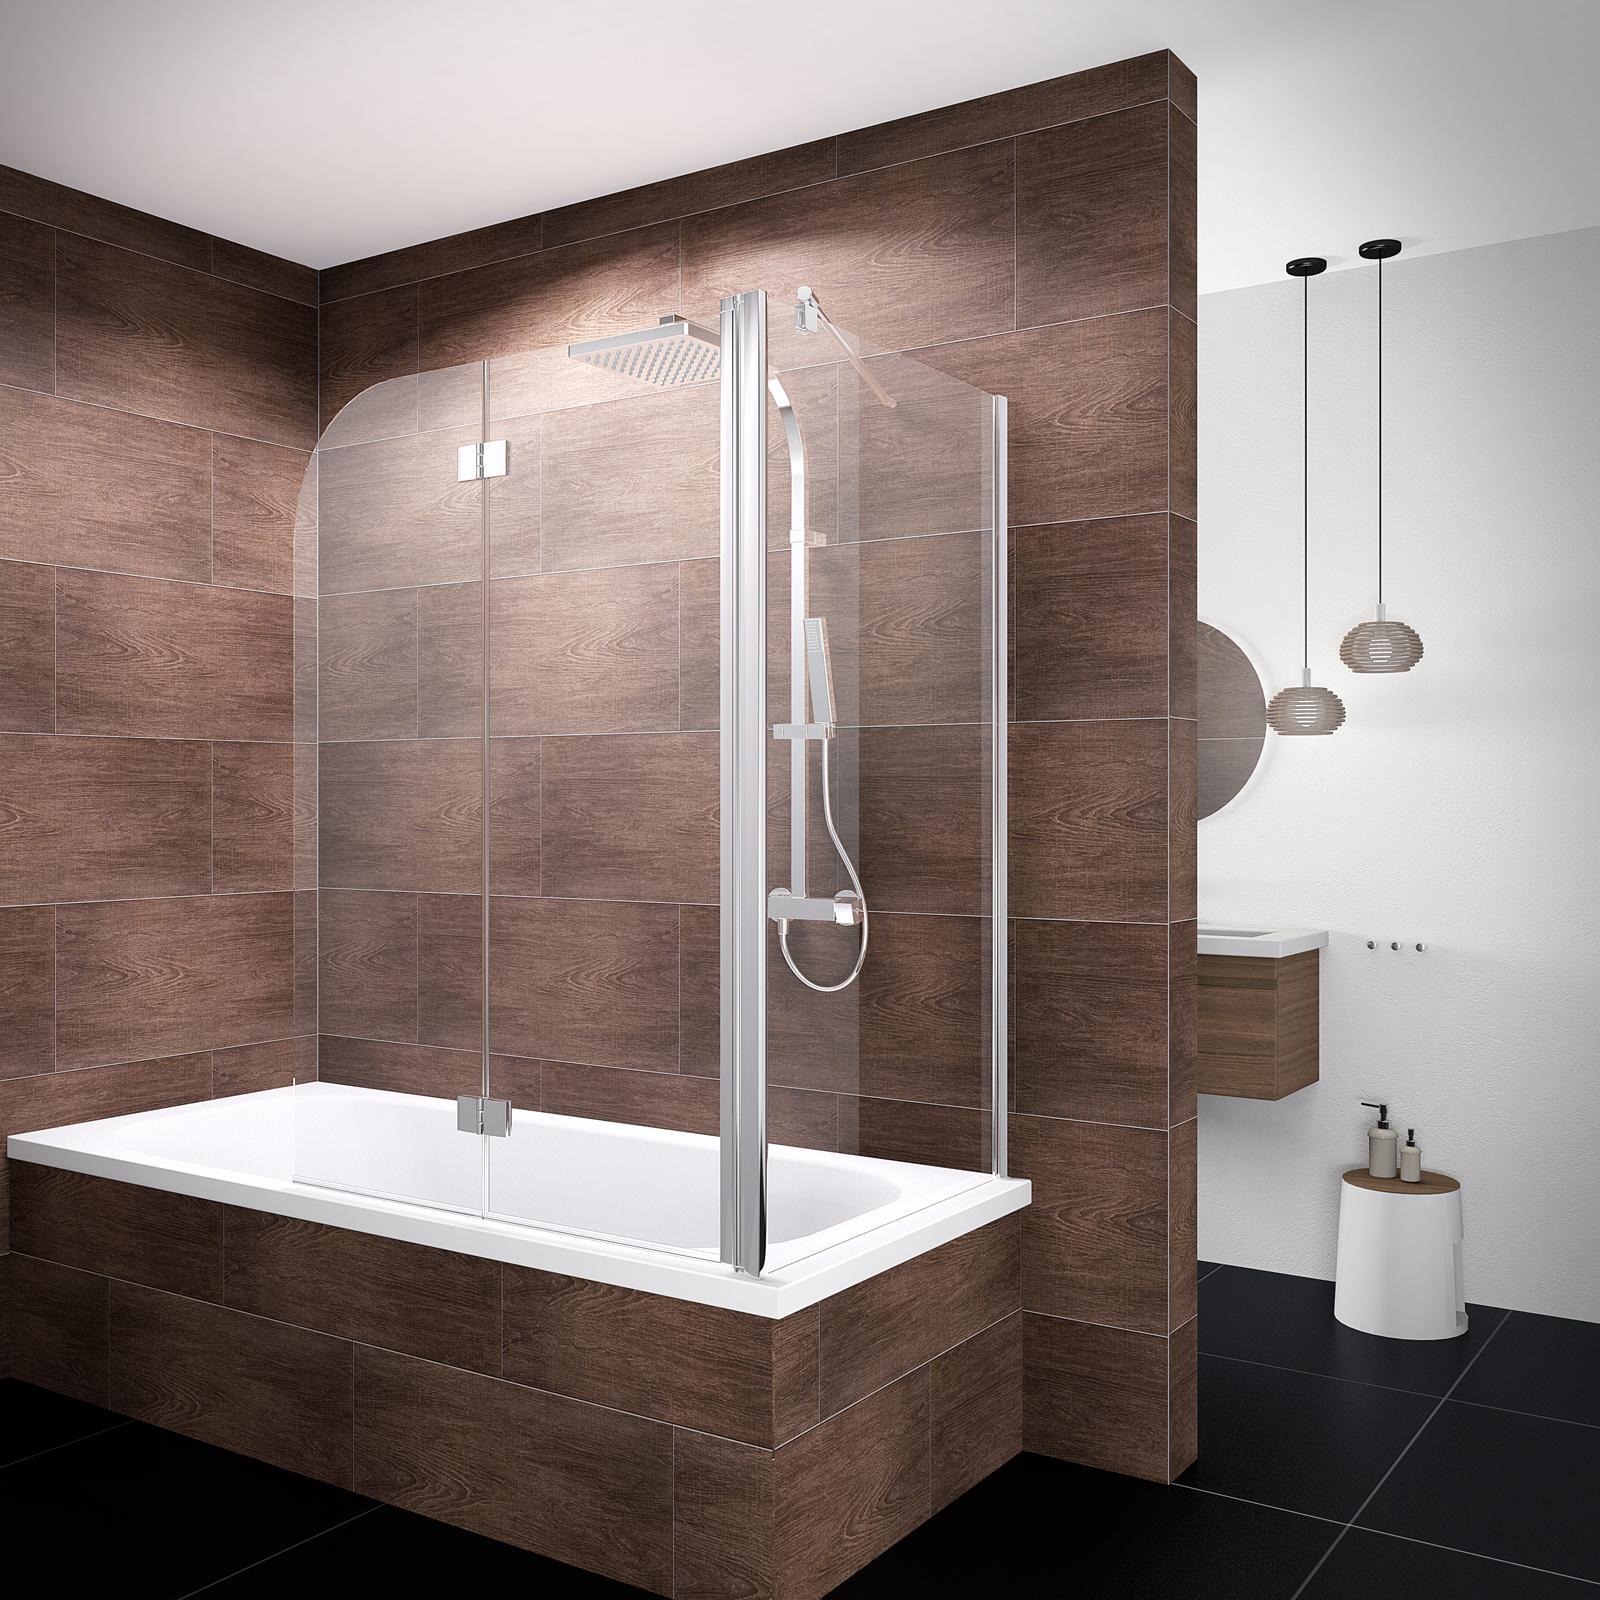 schulte duschwand angle 120x75x140 cm 2 teilig faltbar feste seitenwand sicherheitsglas. Black Bedroom Furniture Sets. Home Design Ideas